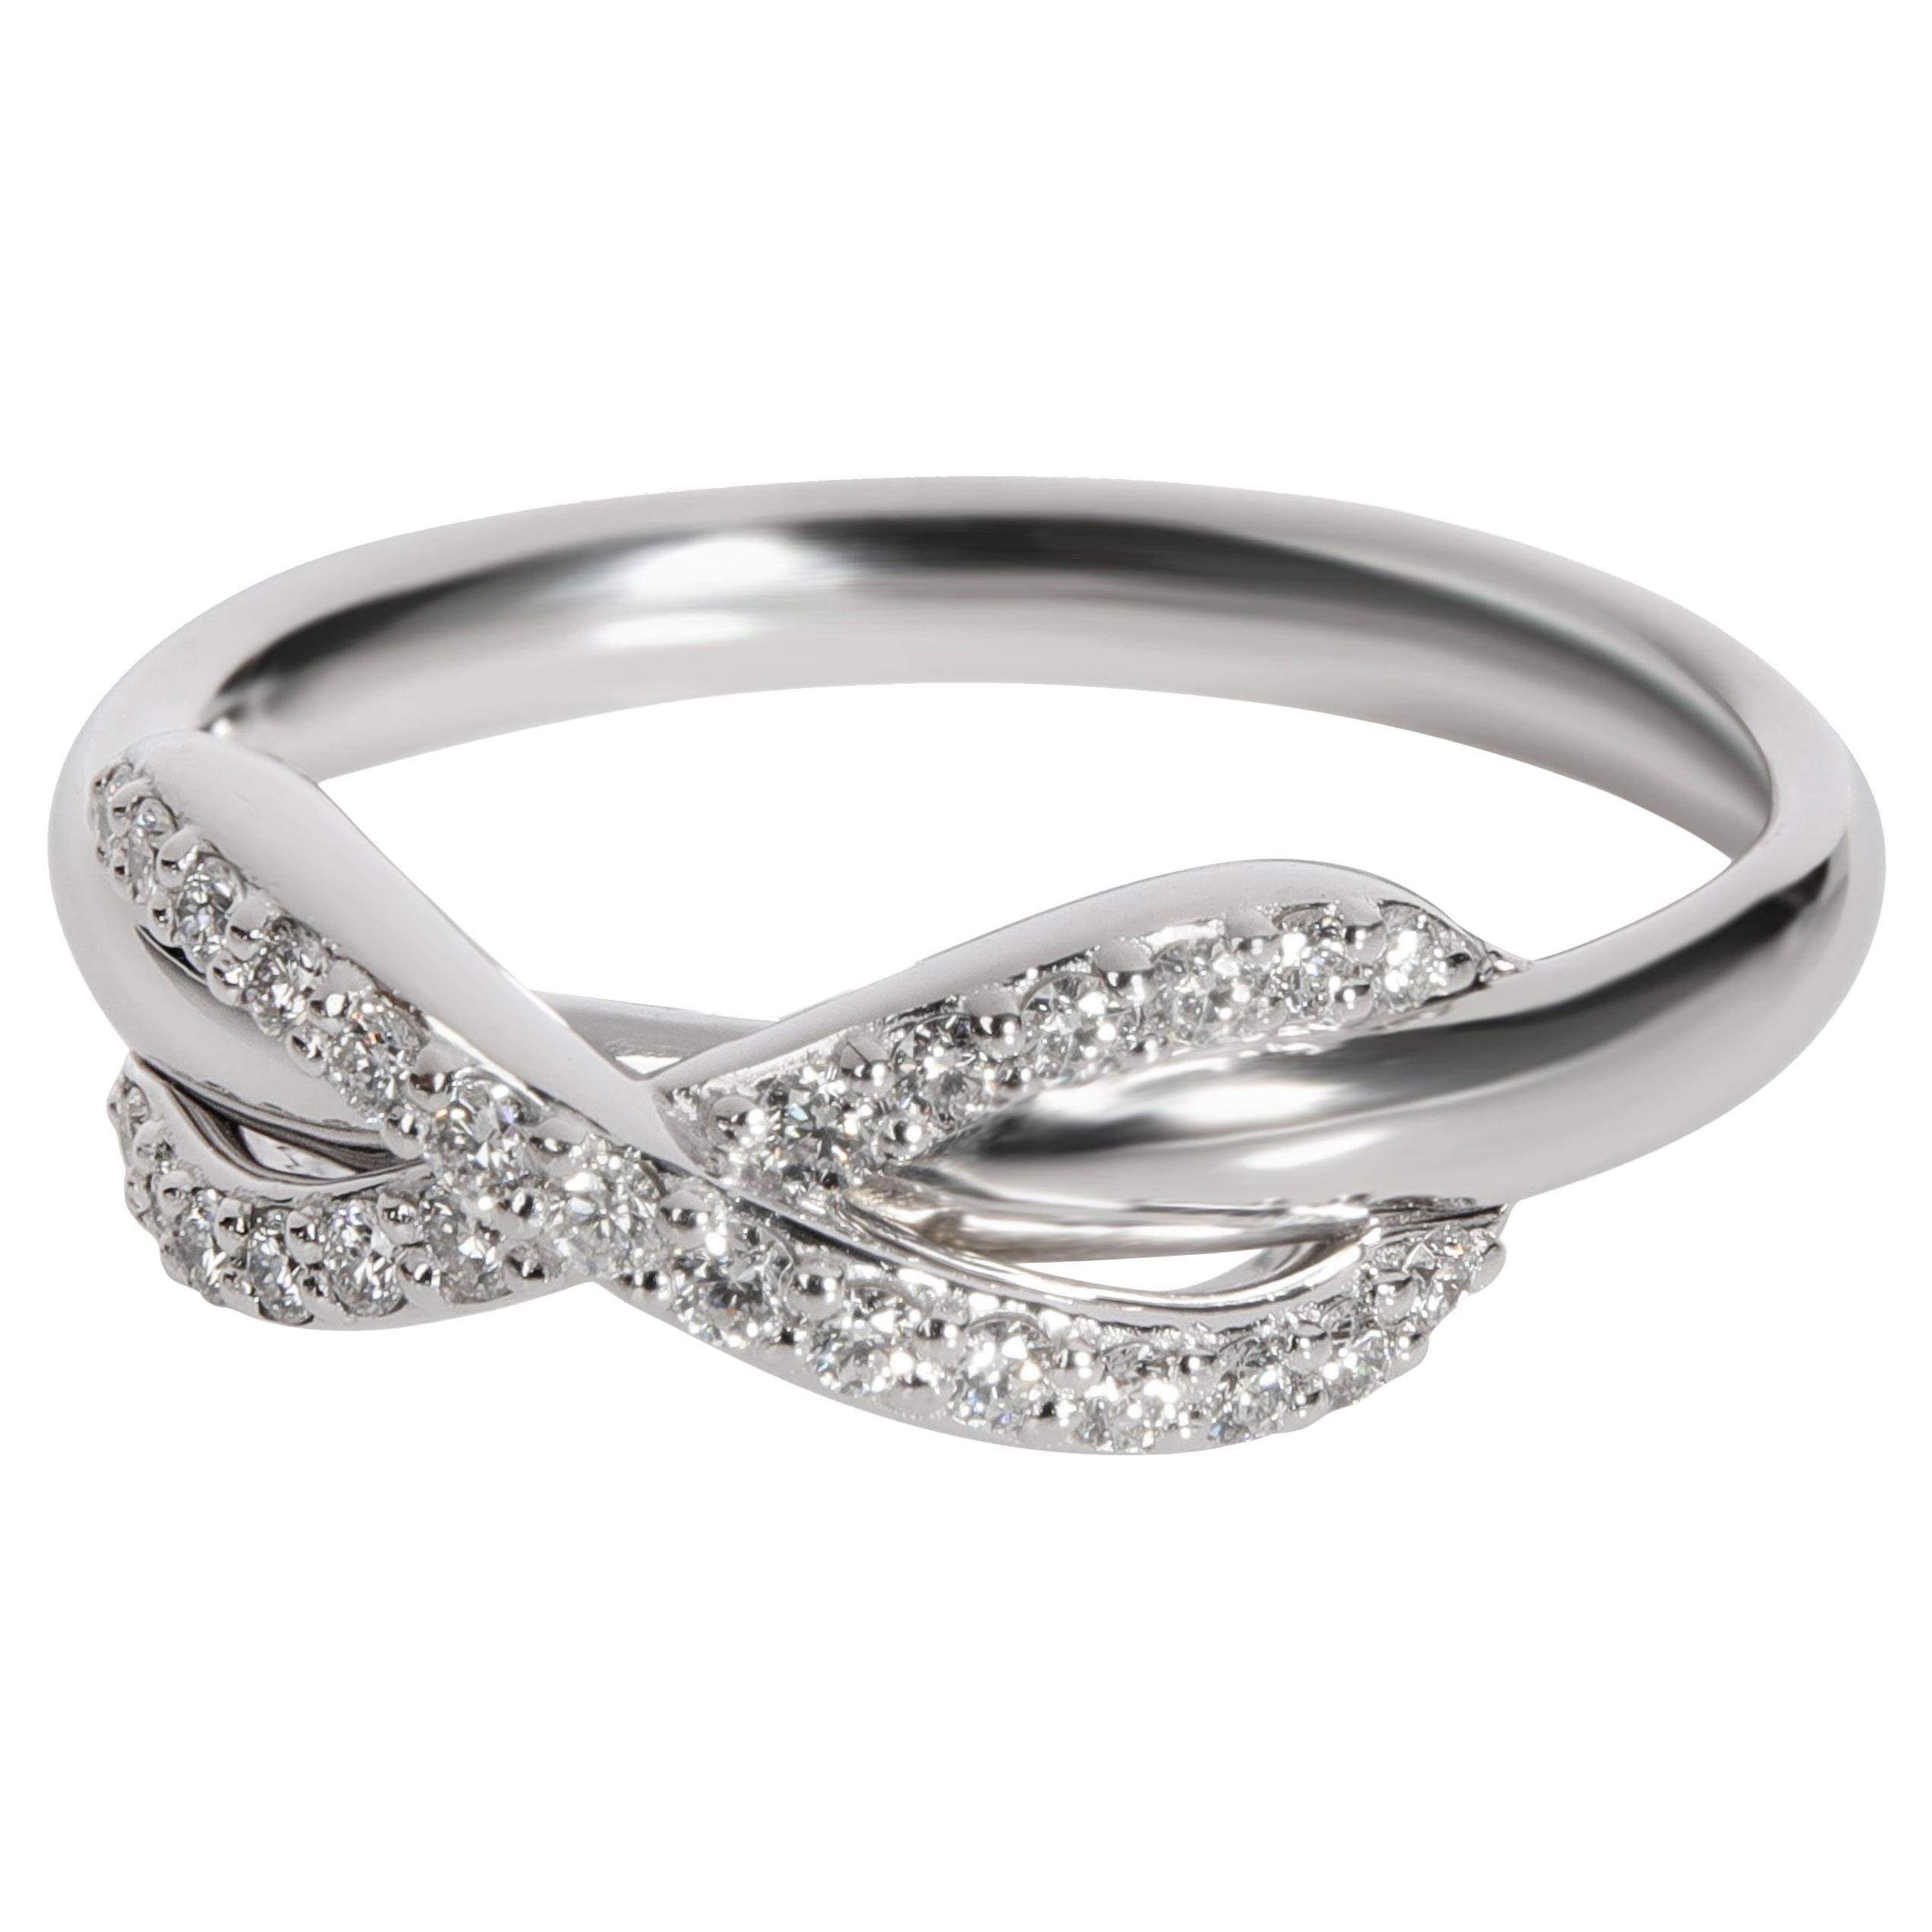 Tiffany & Co. Diamond Infinity Ring in 18k White Gold 0.13 CTW